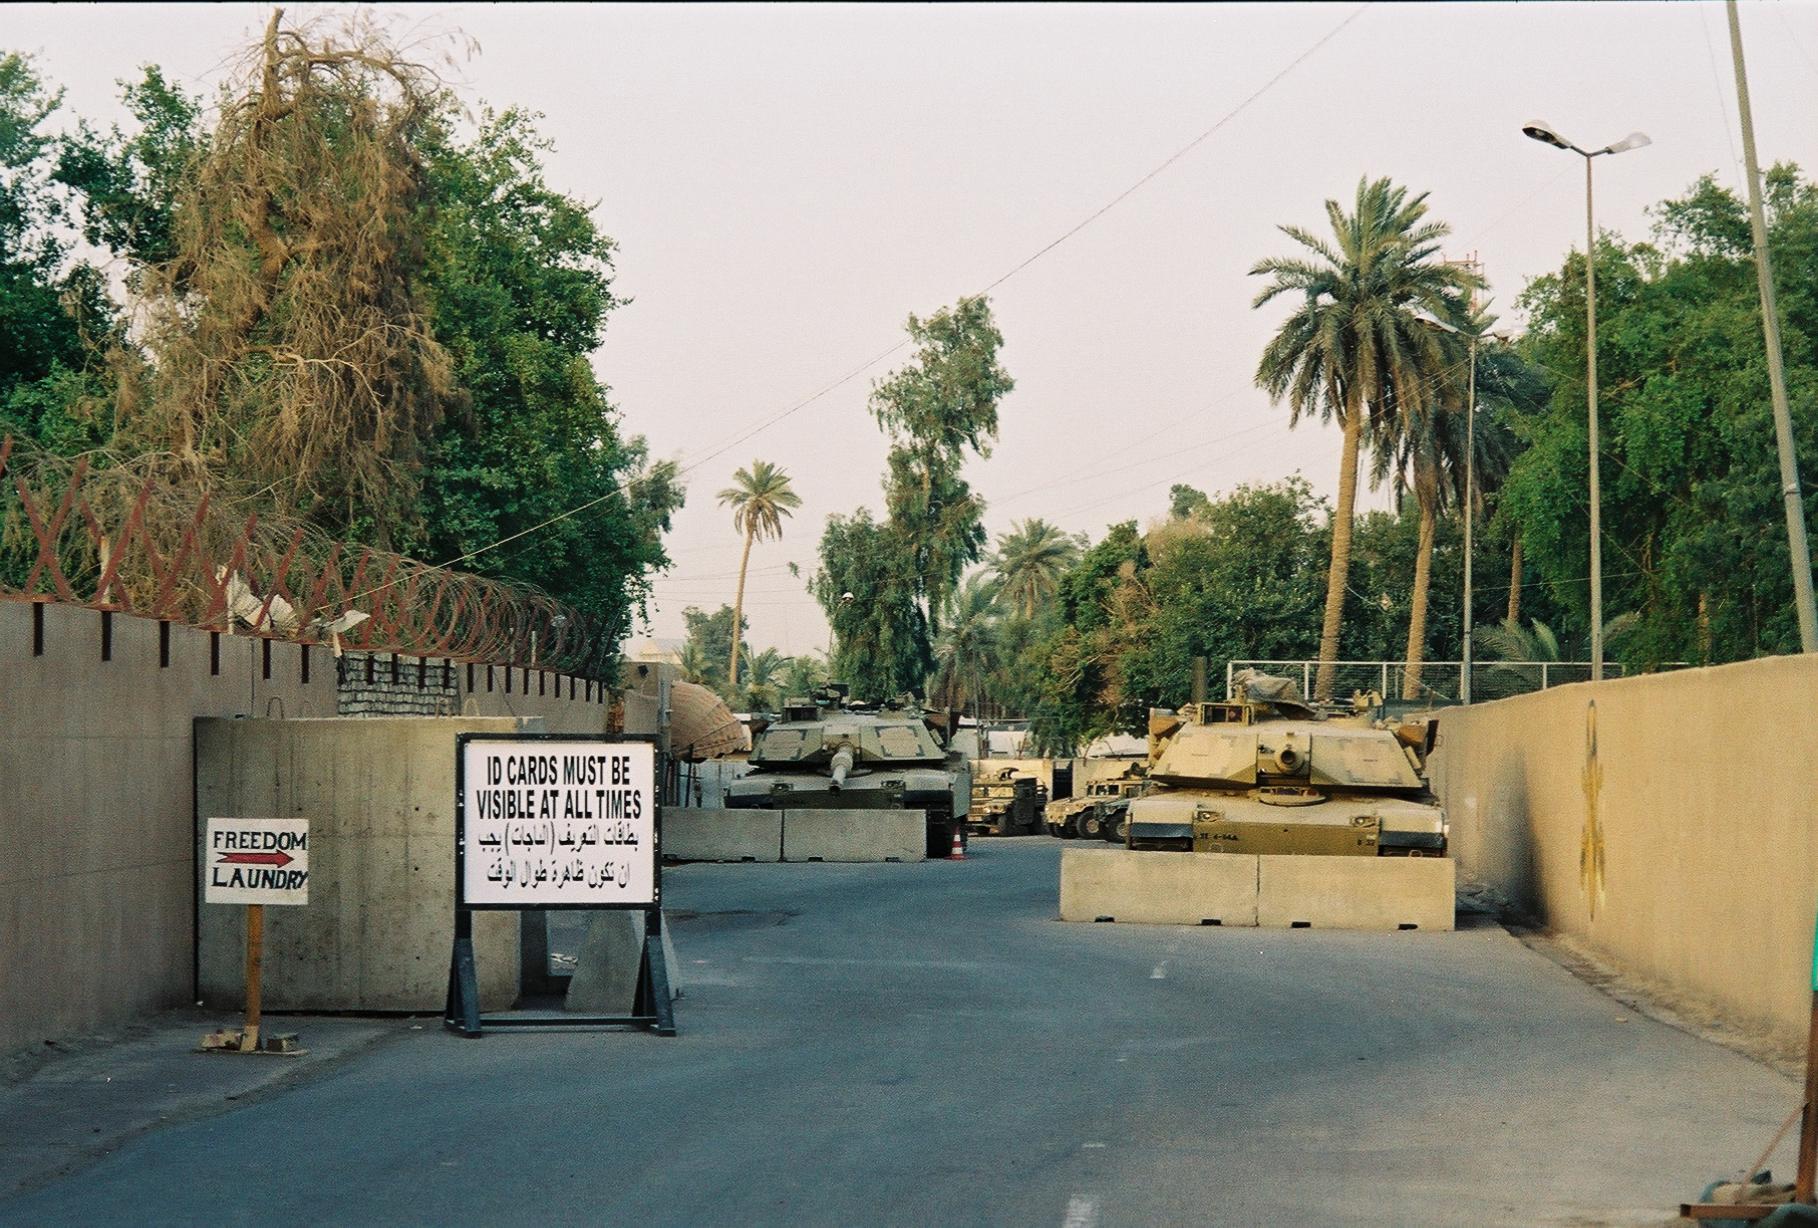 Iraq Photos Oct 2005 057 (2).jpg